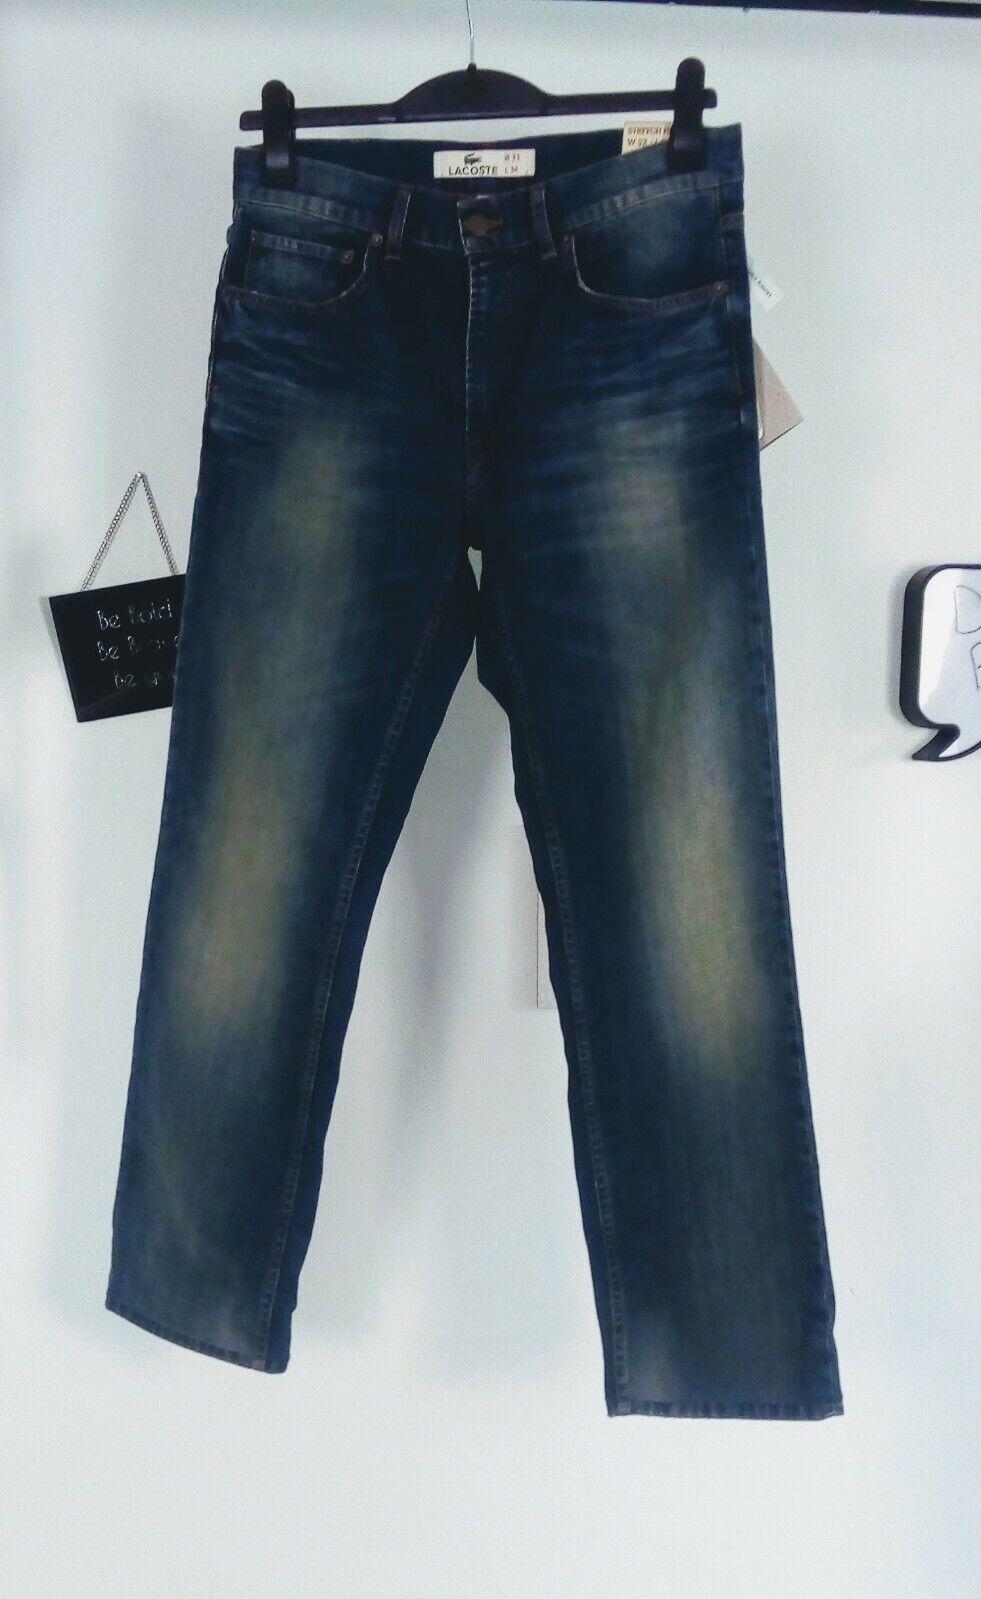 Lacoste mens jeans waist 32 inside leg 30 34 sexy